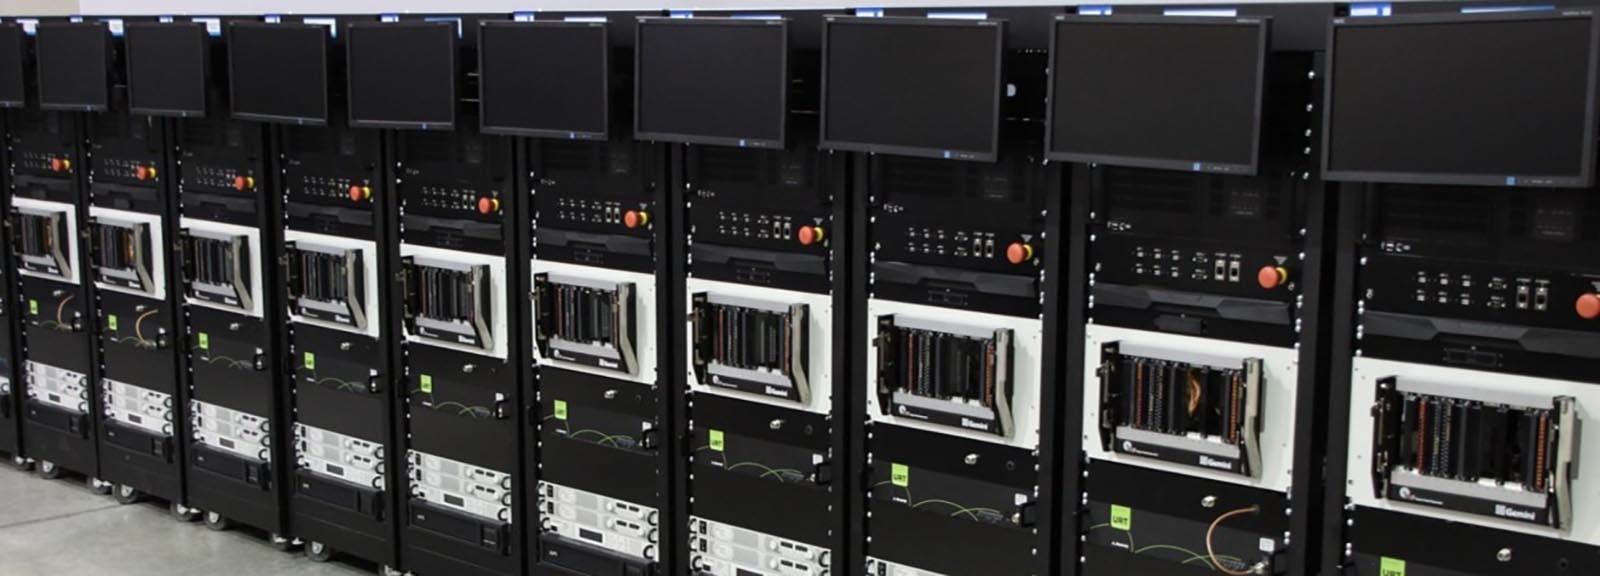 test systems banner.jpg